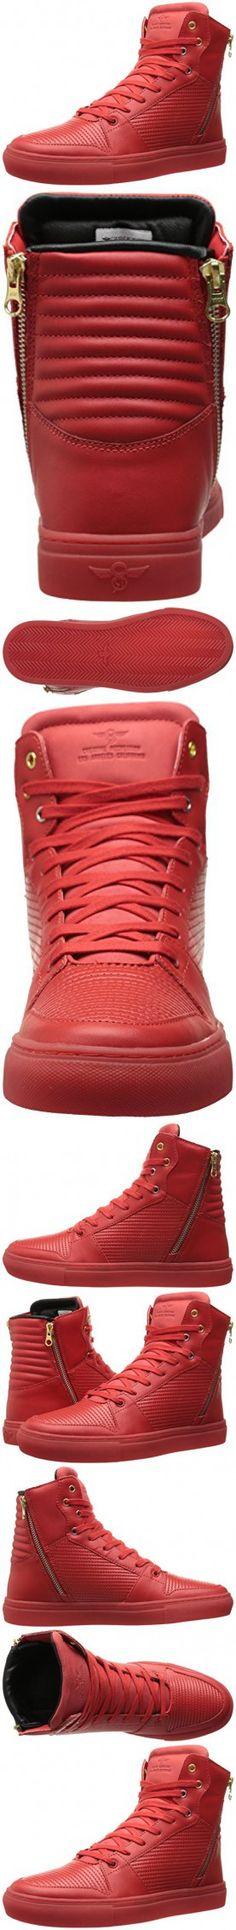 online store 39e15 4b508 Creative Recreation Men s Adonis Fashion Sneaker. Fresh Shoes ...